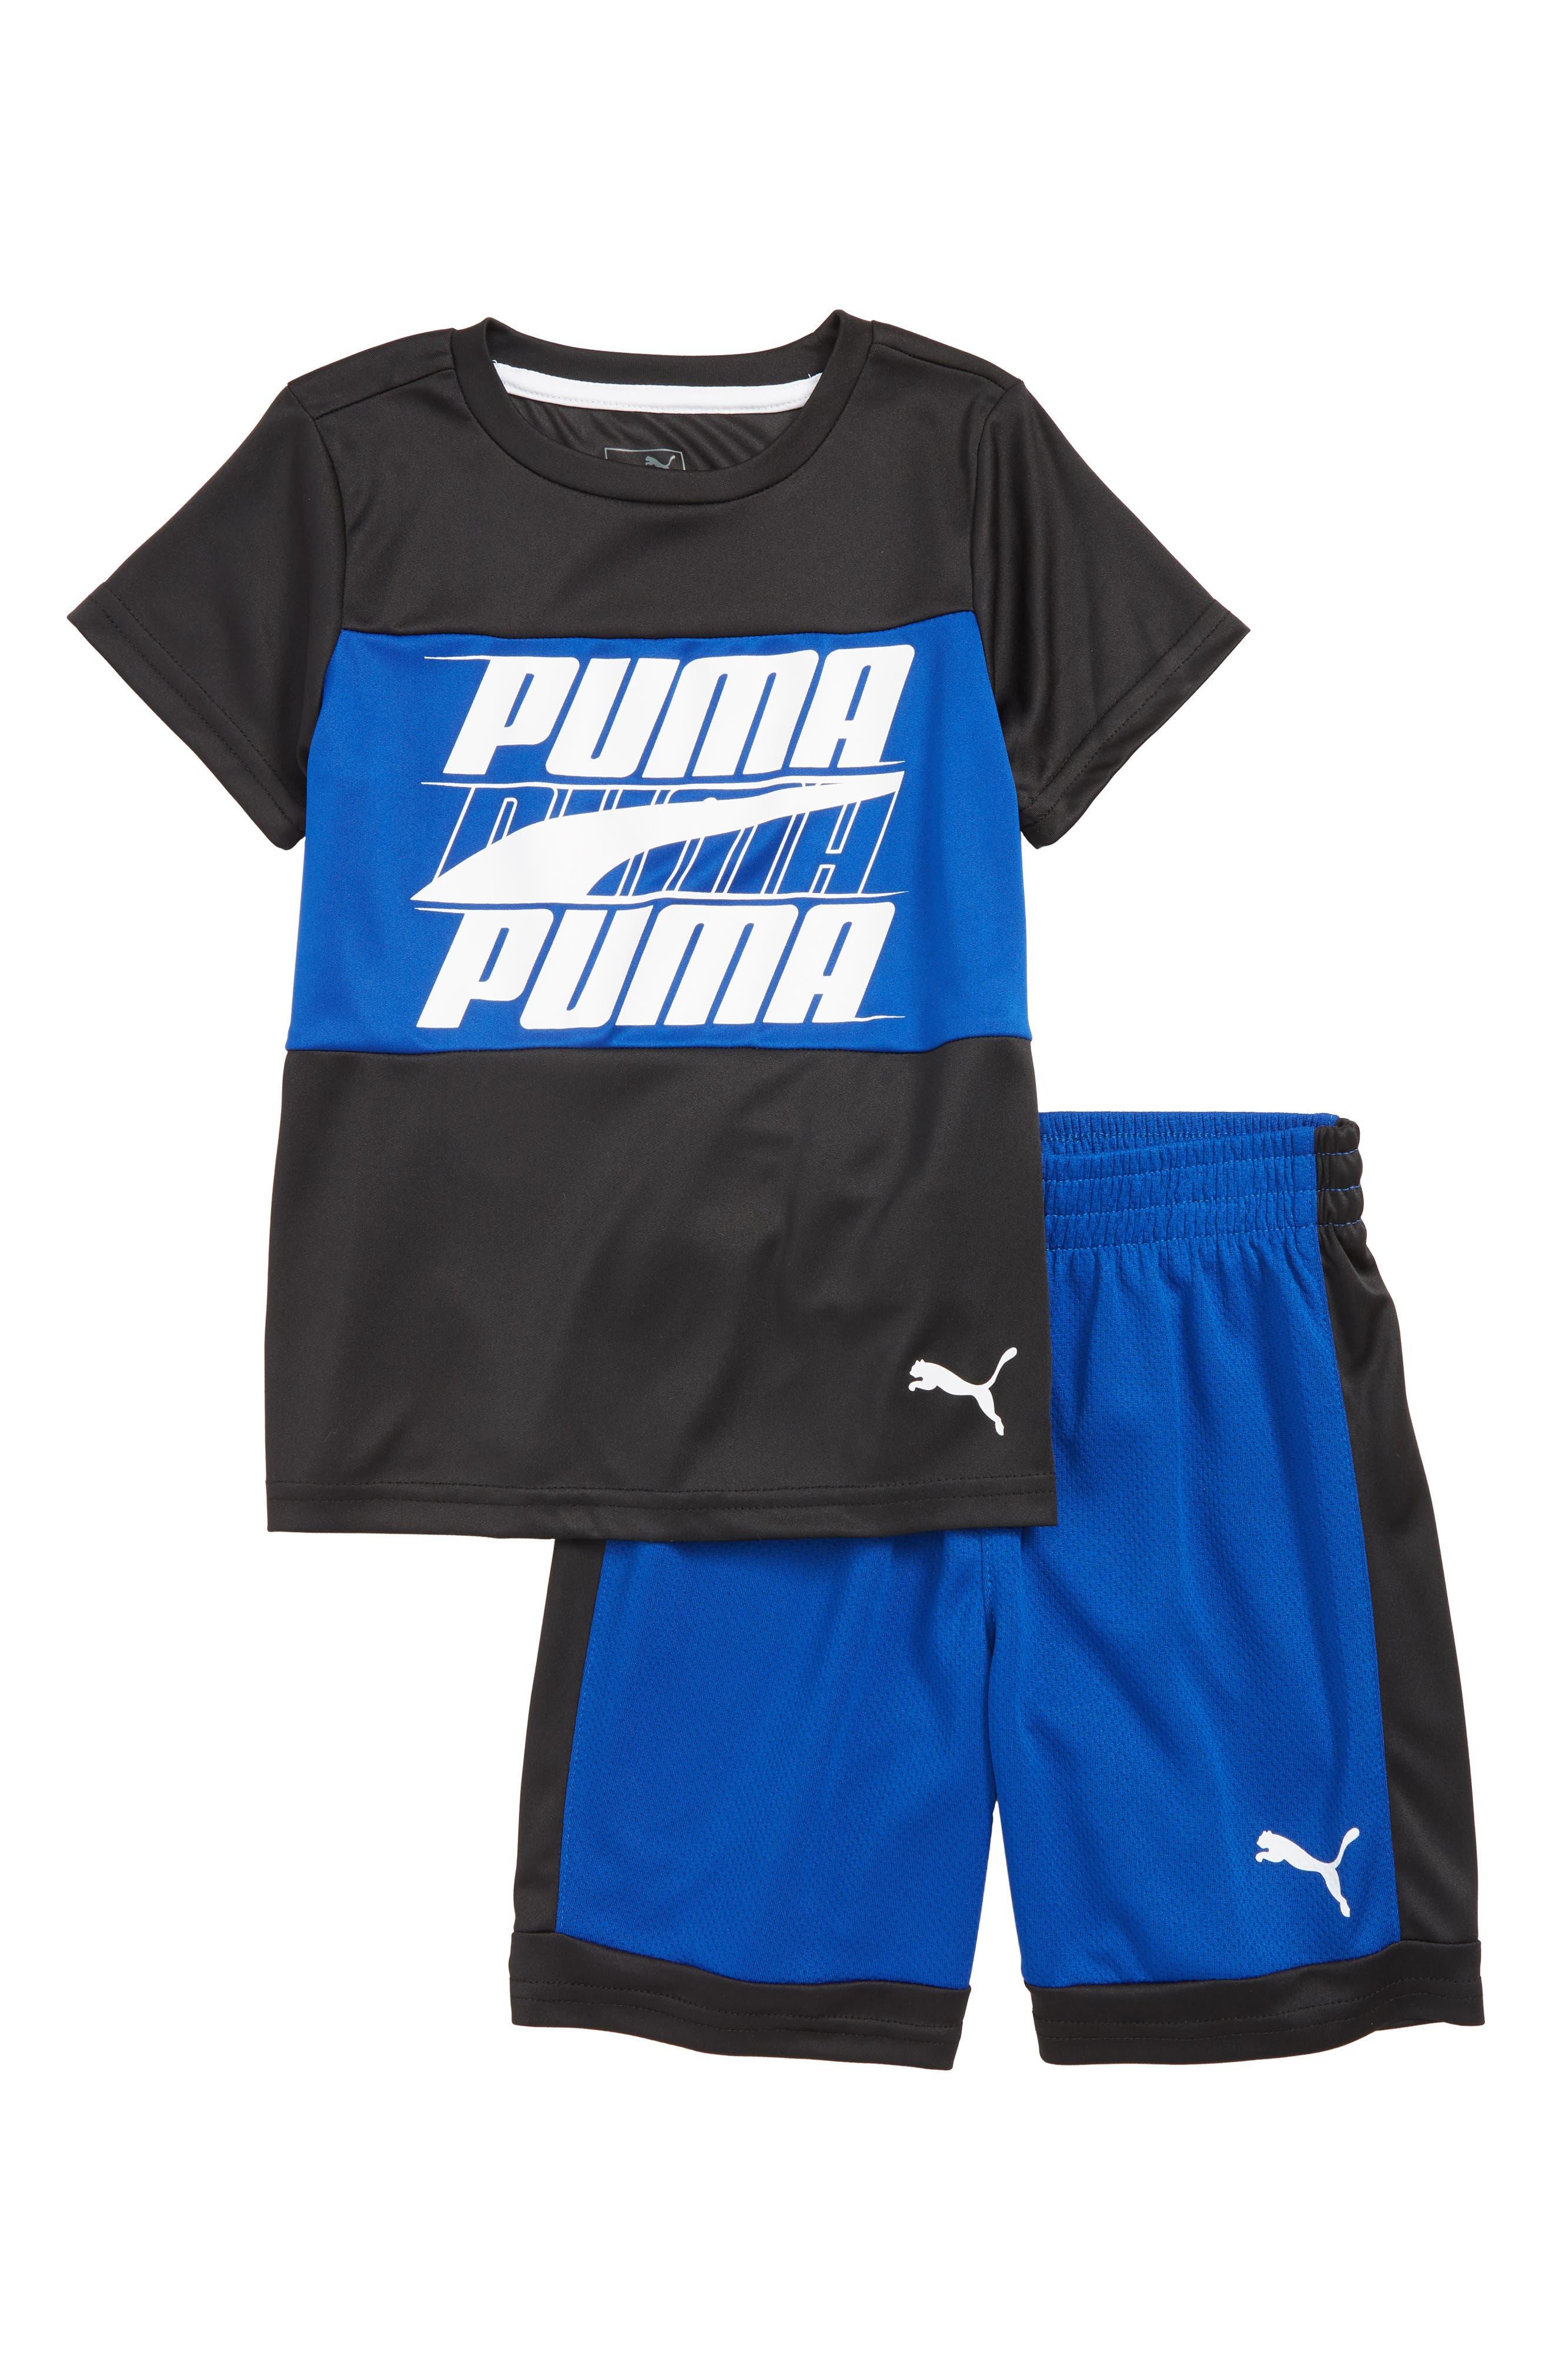 Toddler Boys Puma Logo TShirt  Performance Mesh Shorts Set